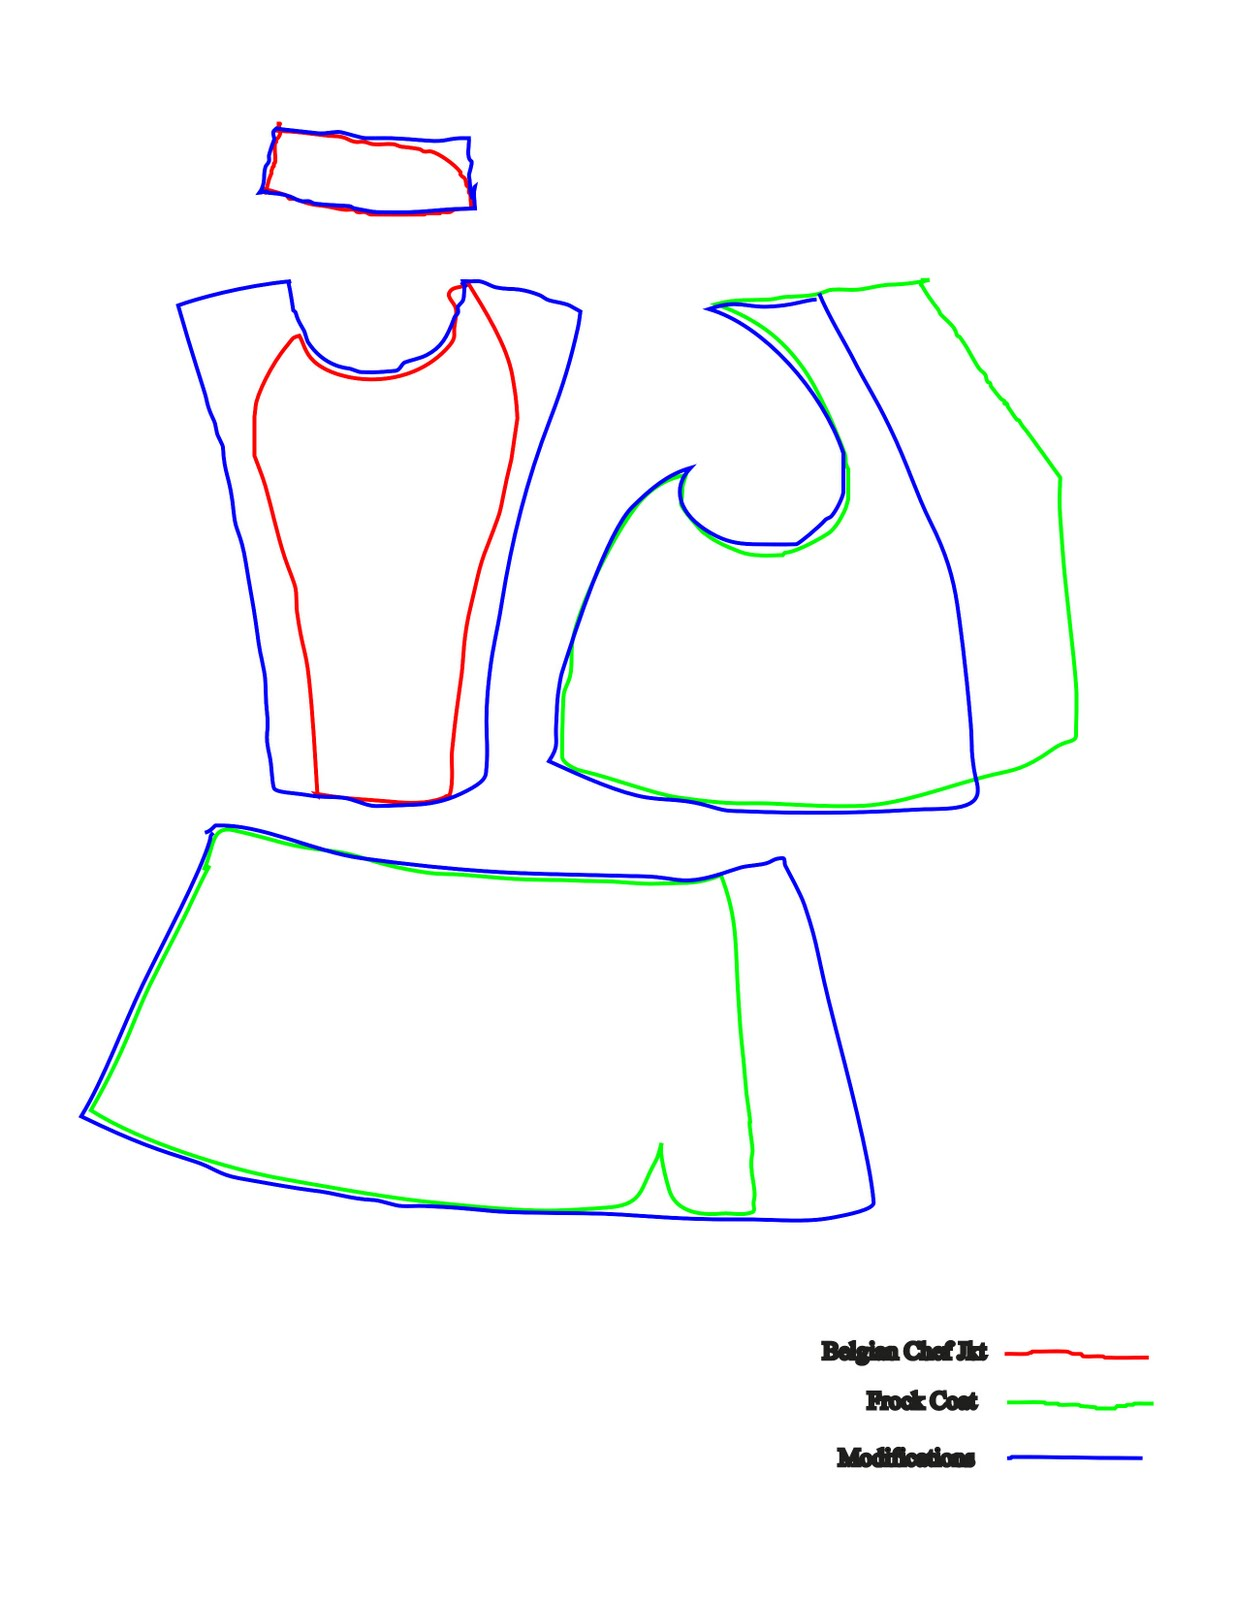 Women's chef coat sewing pattern